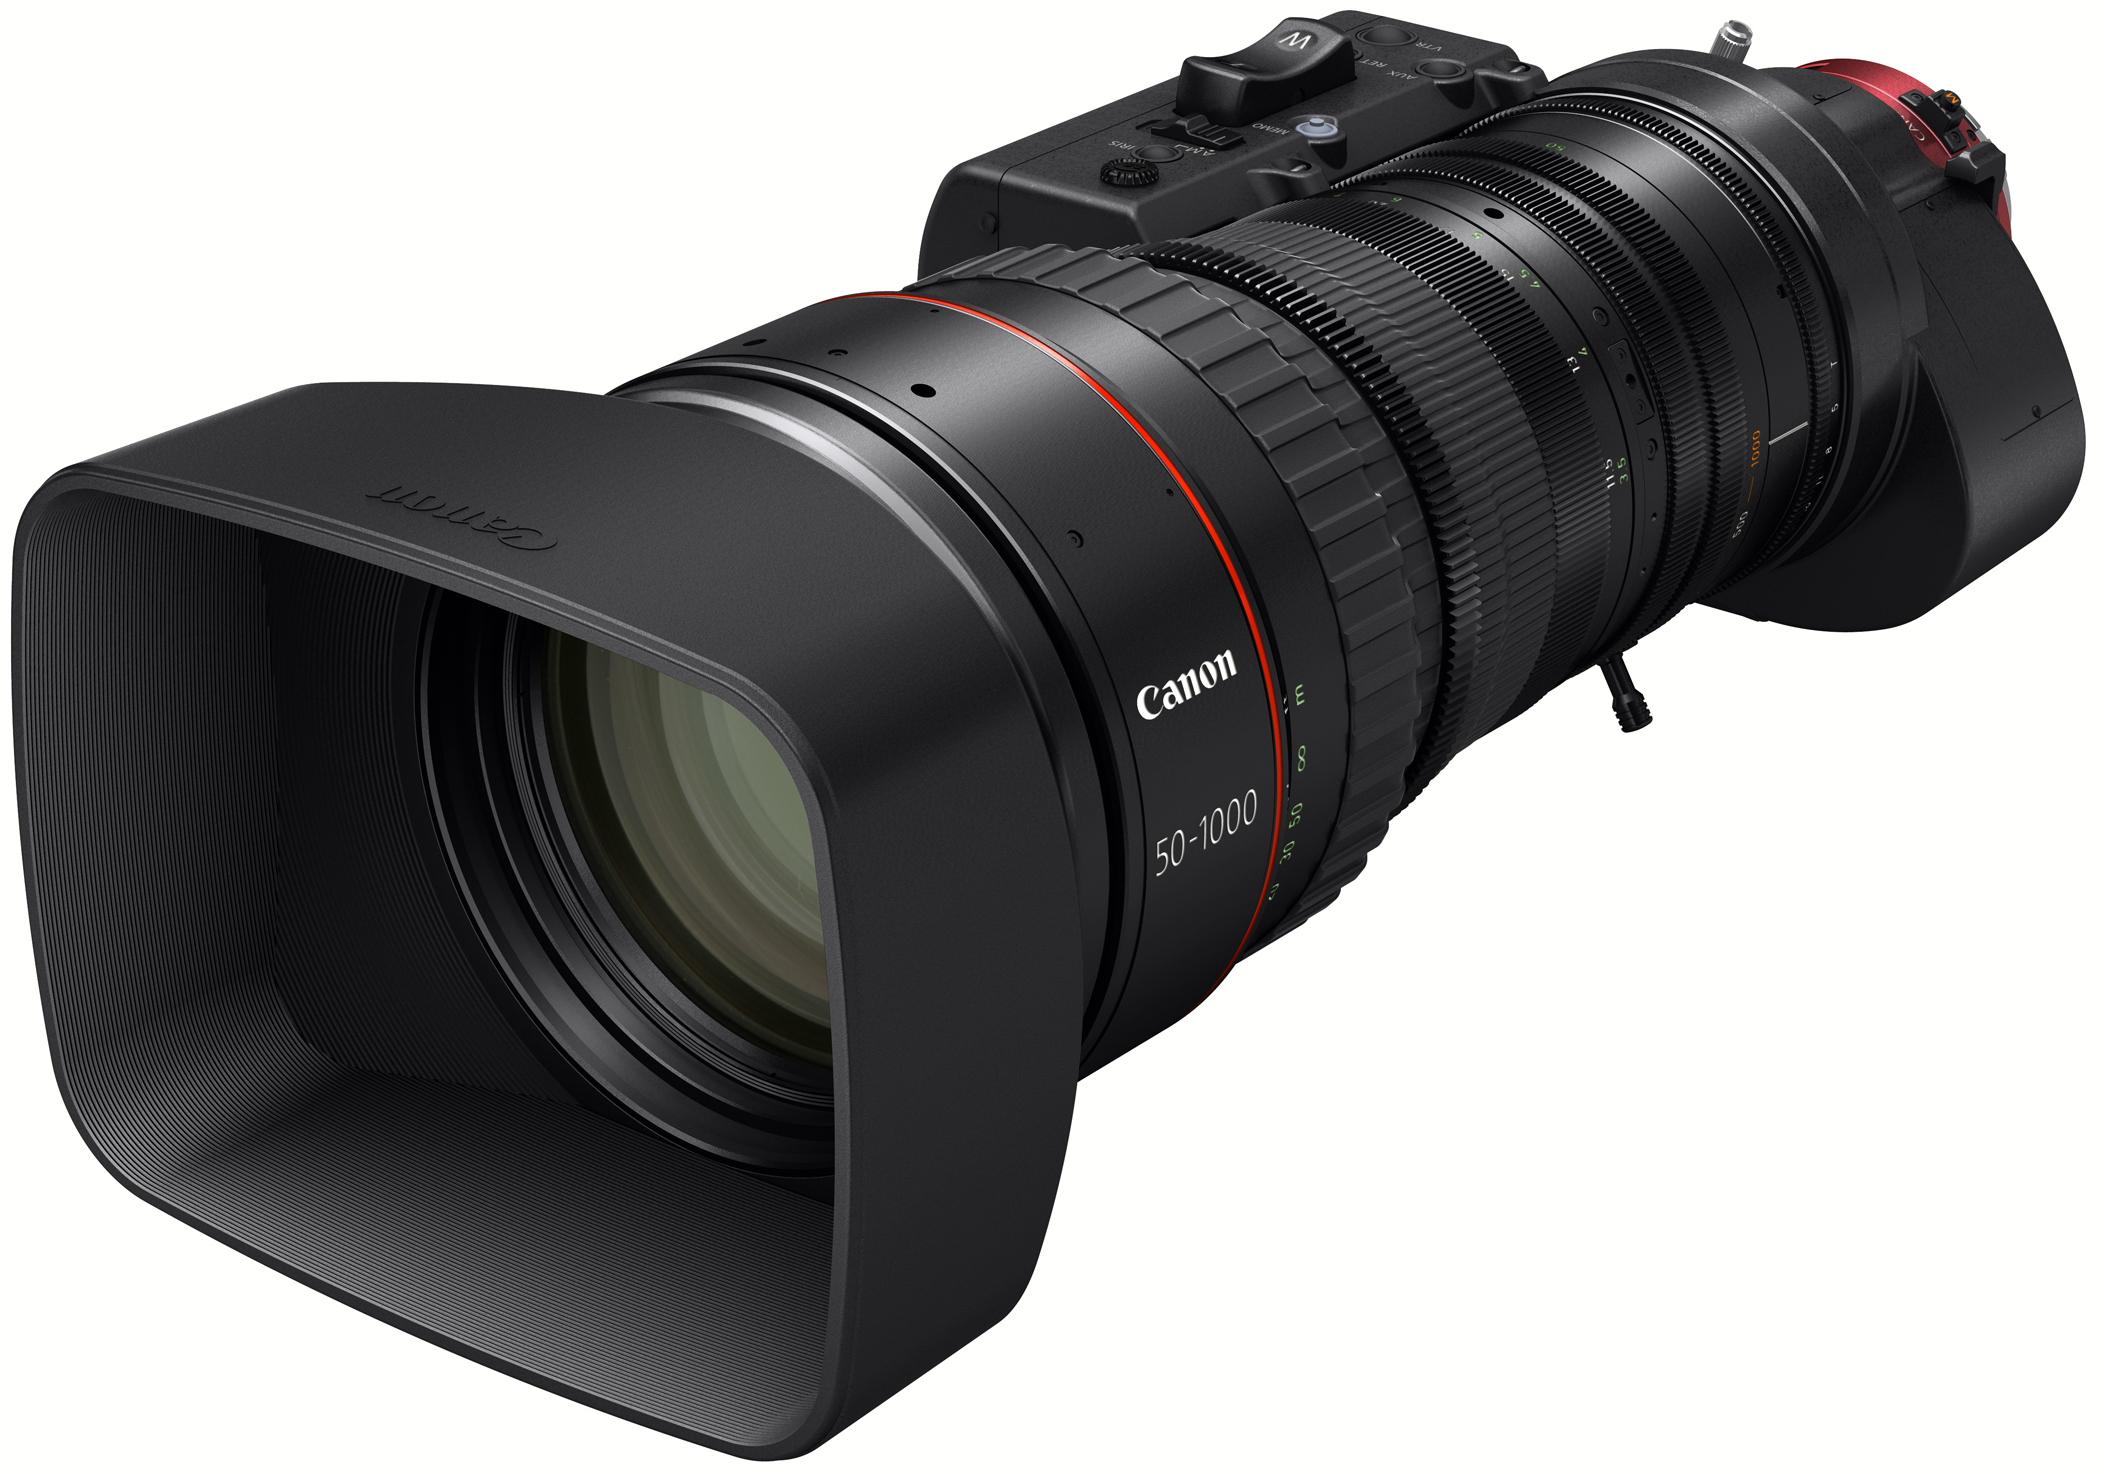 Canon U.S.A. Introduces New CINE-SERVO 25-250mm T2.95-3.95